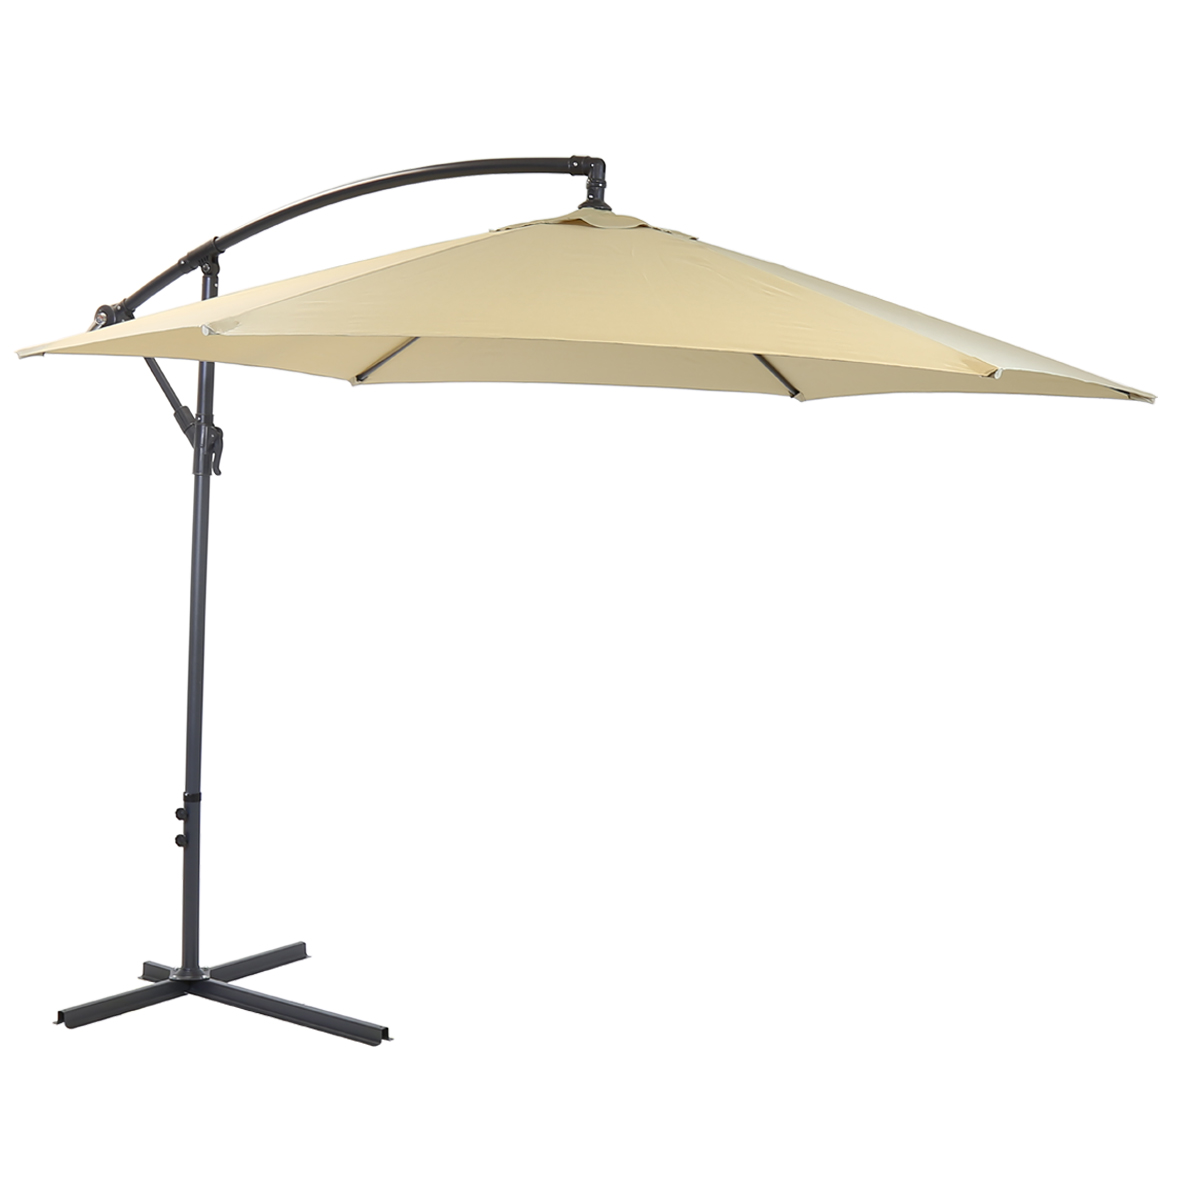 bentley garden 3m hanging banana patio garden umbrella. Black Bedroom Furniture Sets. Home Design Ideas